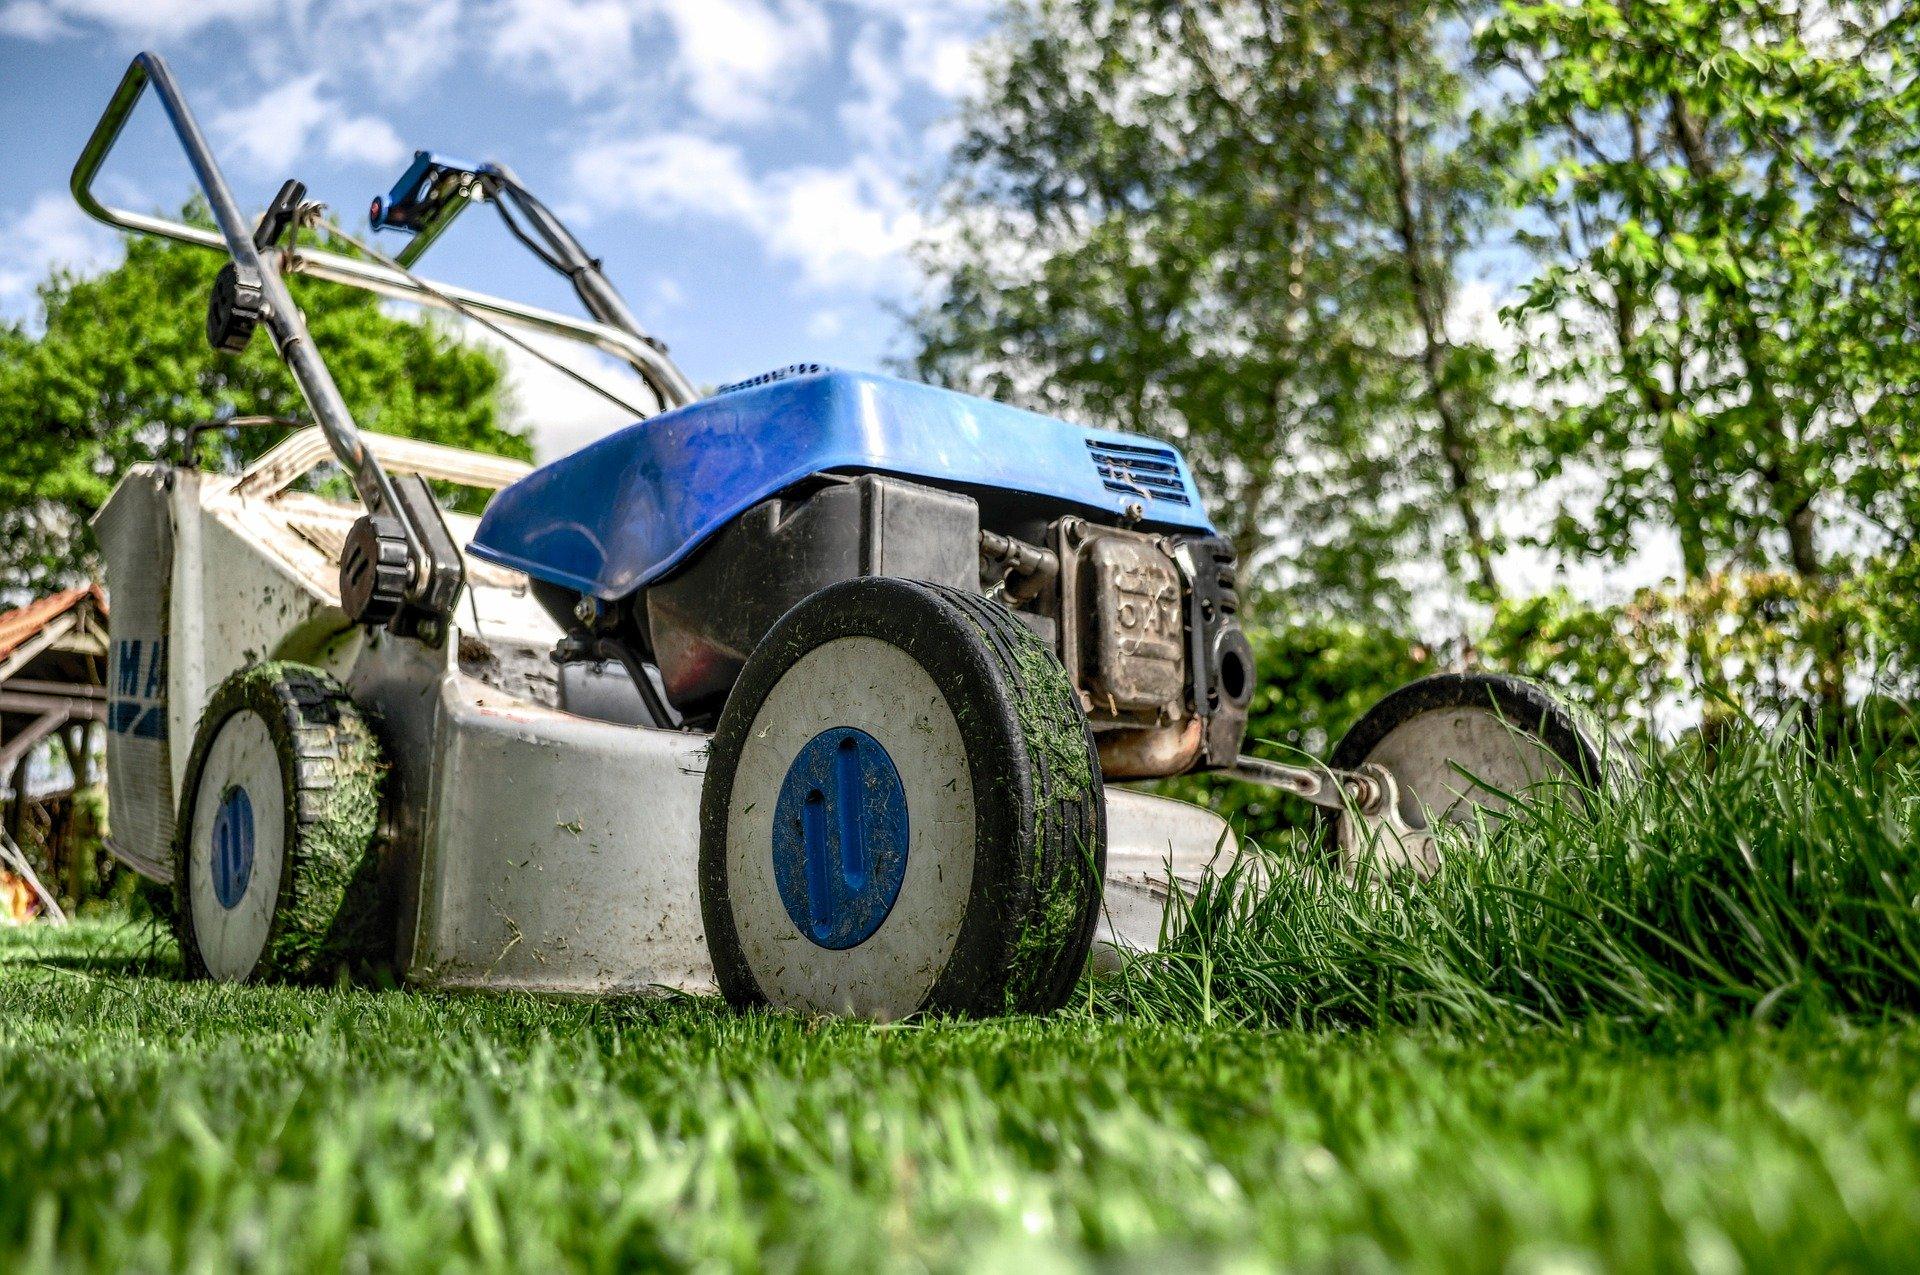 Lawn mower, mowing grass.